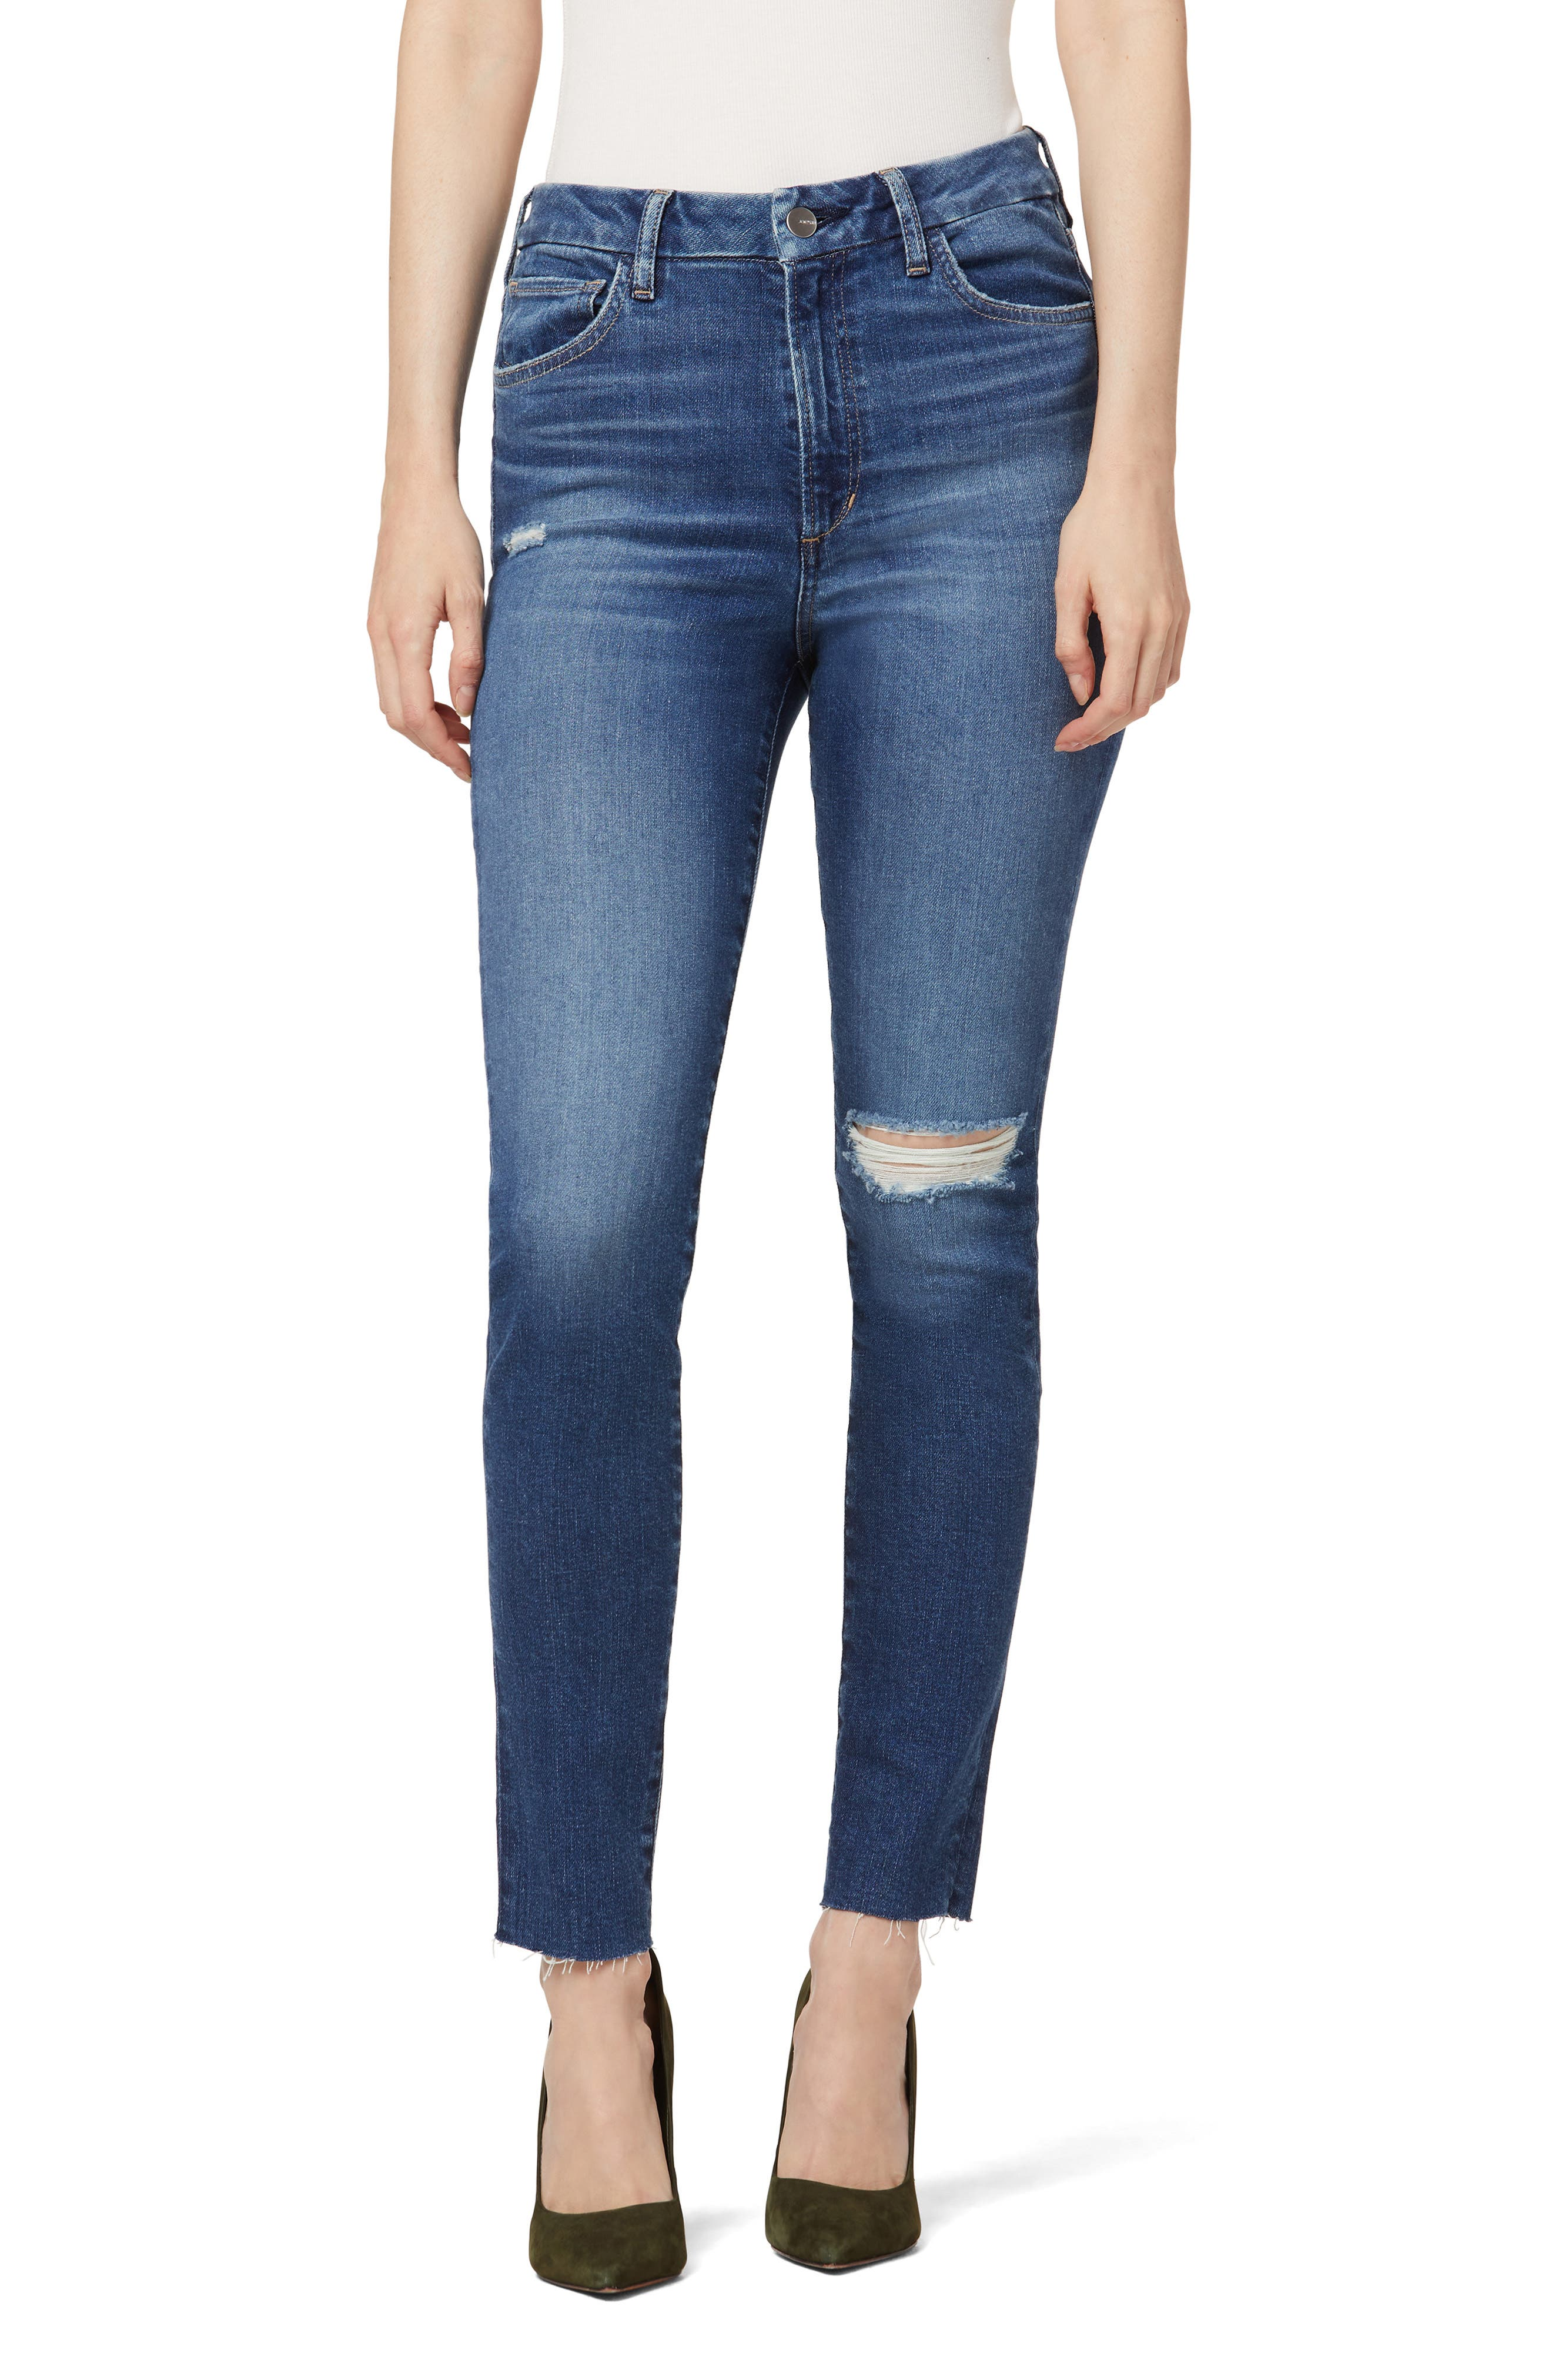 The Hi Honey High Waist Ankle Skinny Jeans